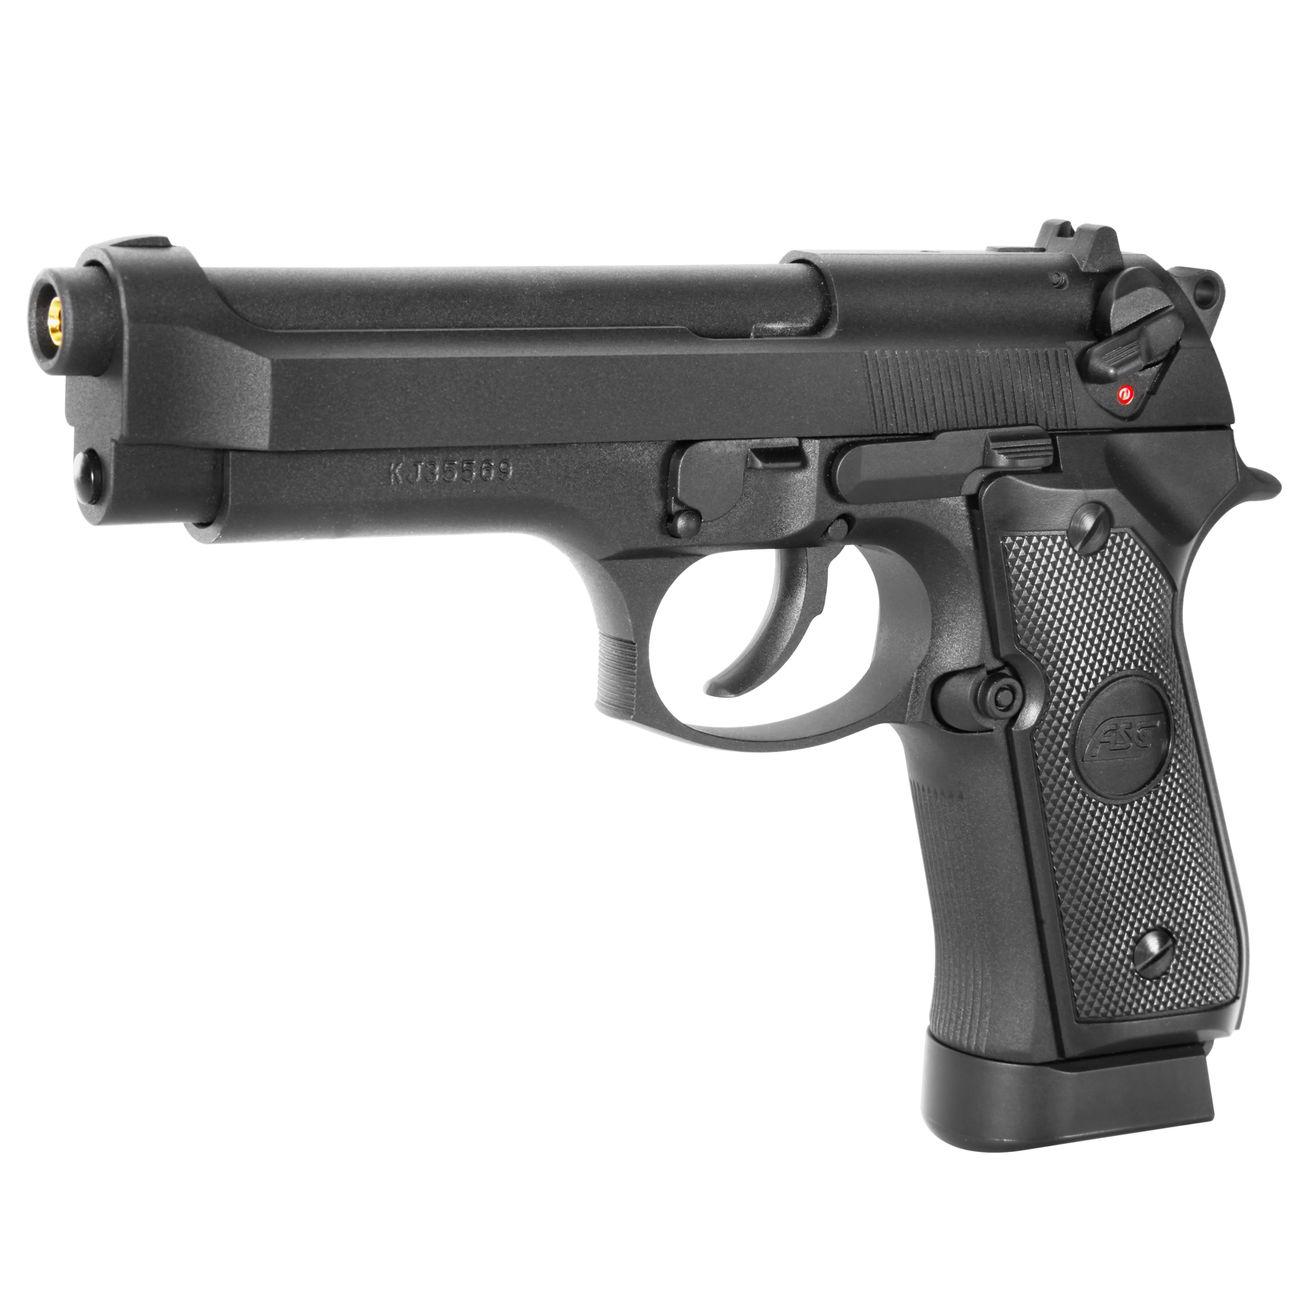 asg x9 classic vollmetall co2 blowback luftpistole 4 5mm bb schwarz versandr ckl ufer g nstig. Black Bedroom Furniture Sets. Home Design Ideas